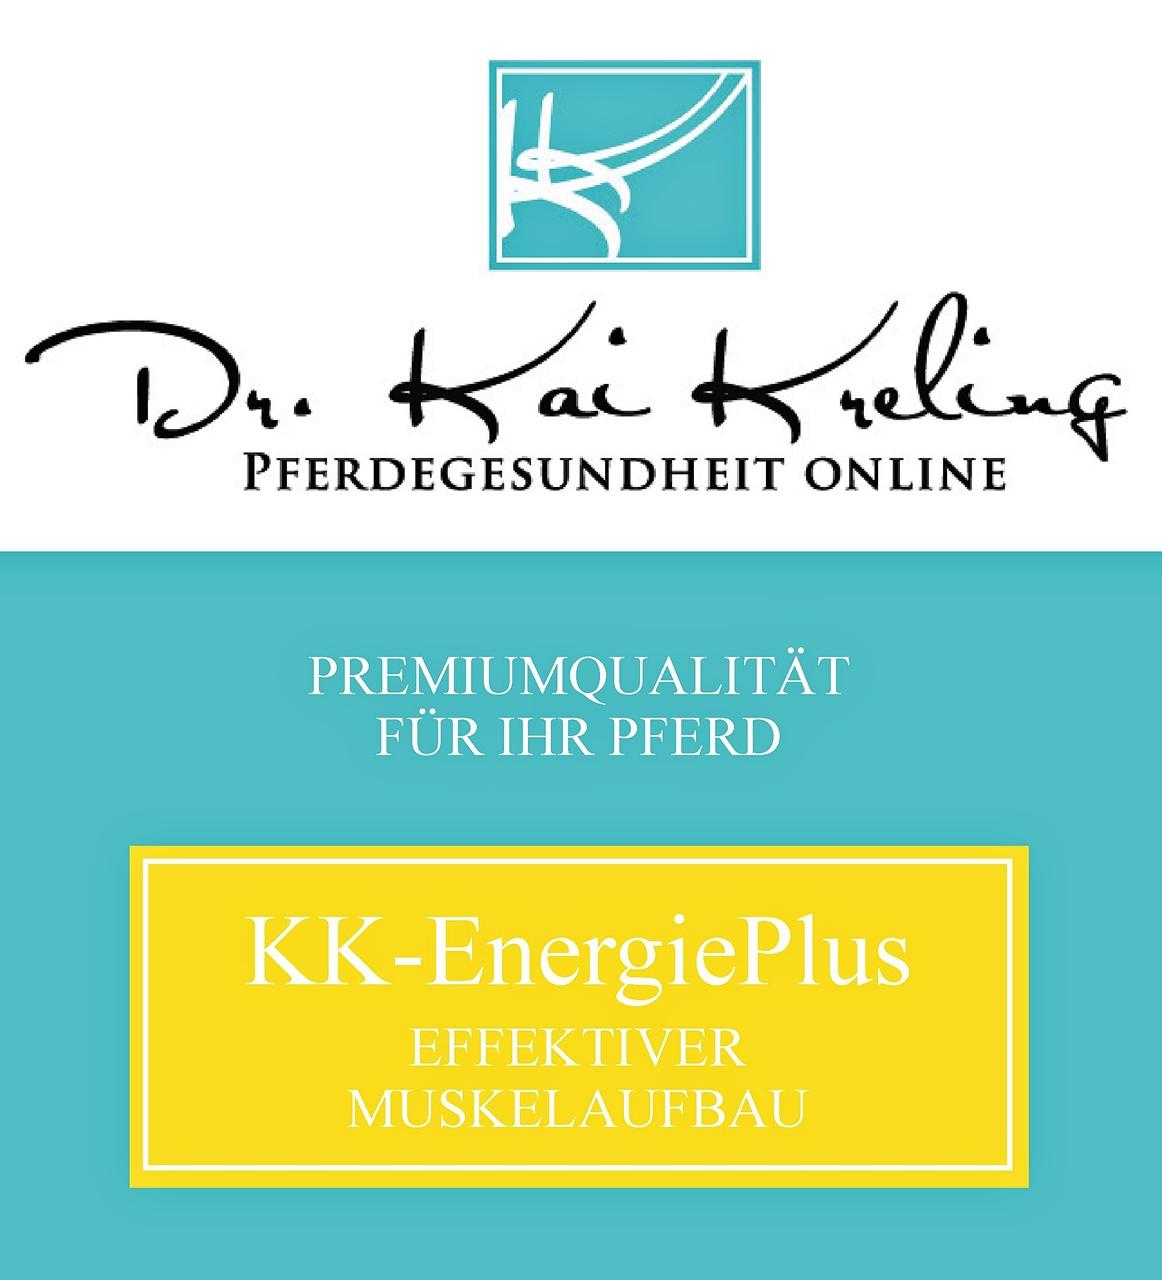 KK-EnergiePlus